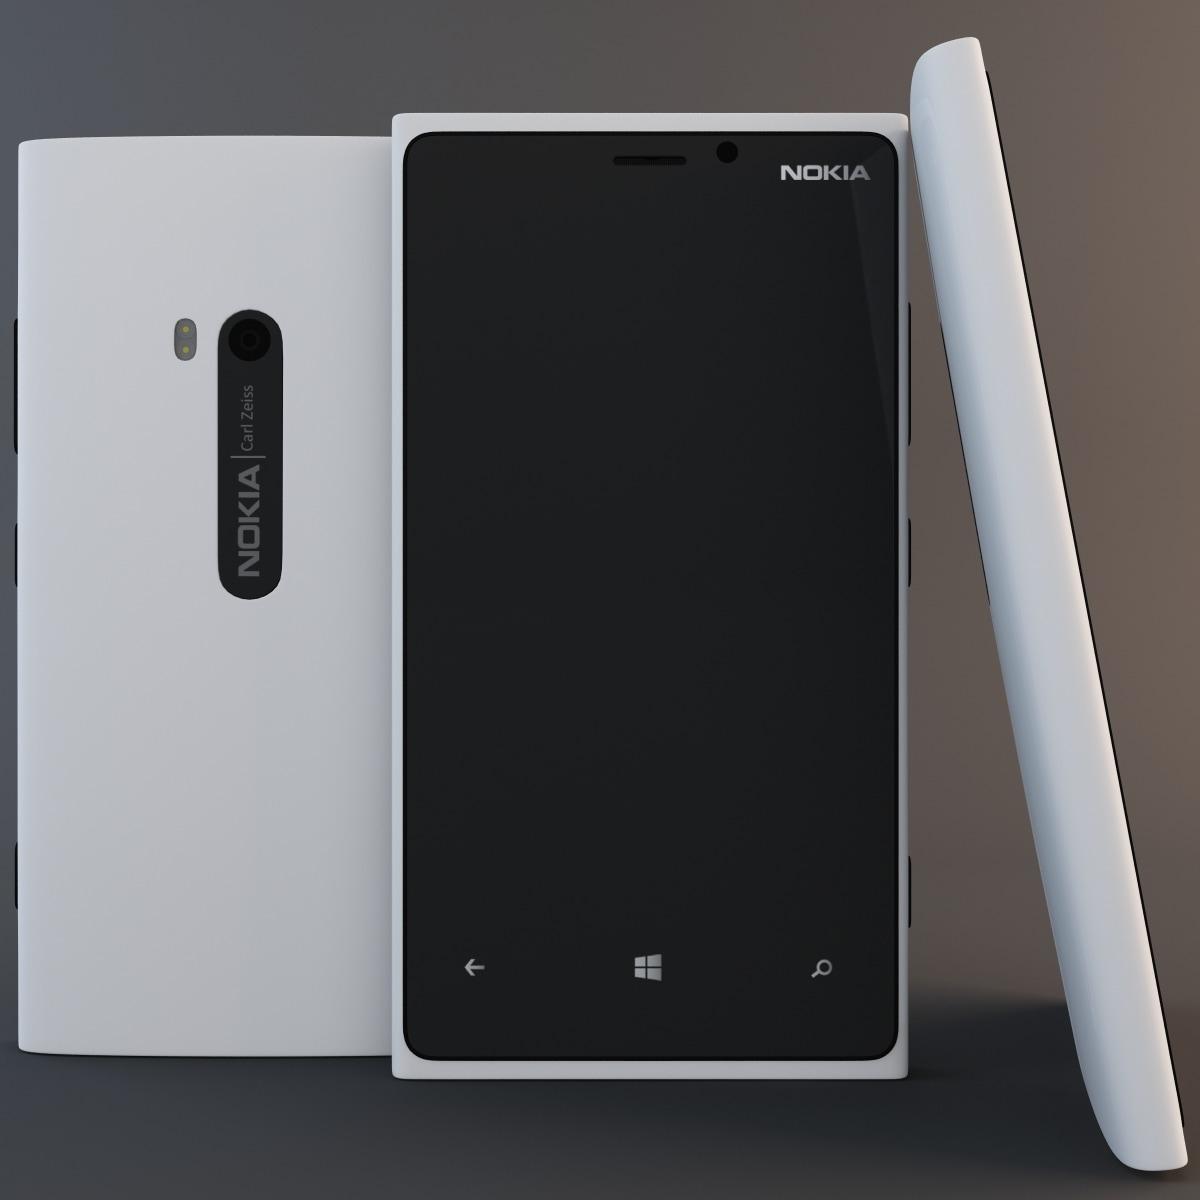 white nokia lumia 920 3d model. Black Bedroom Furniture Sets. Home Design Ideas